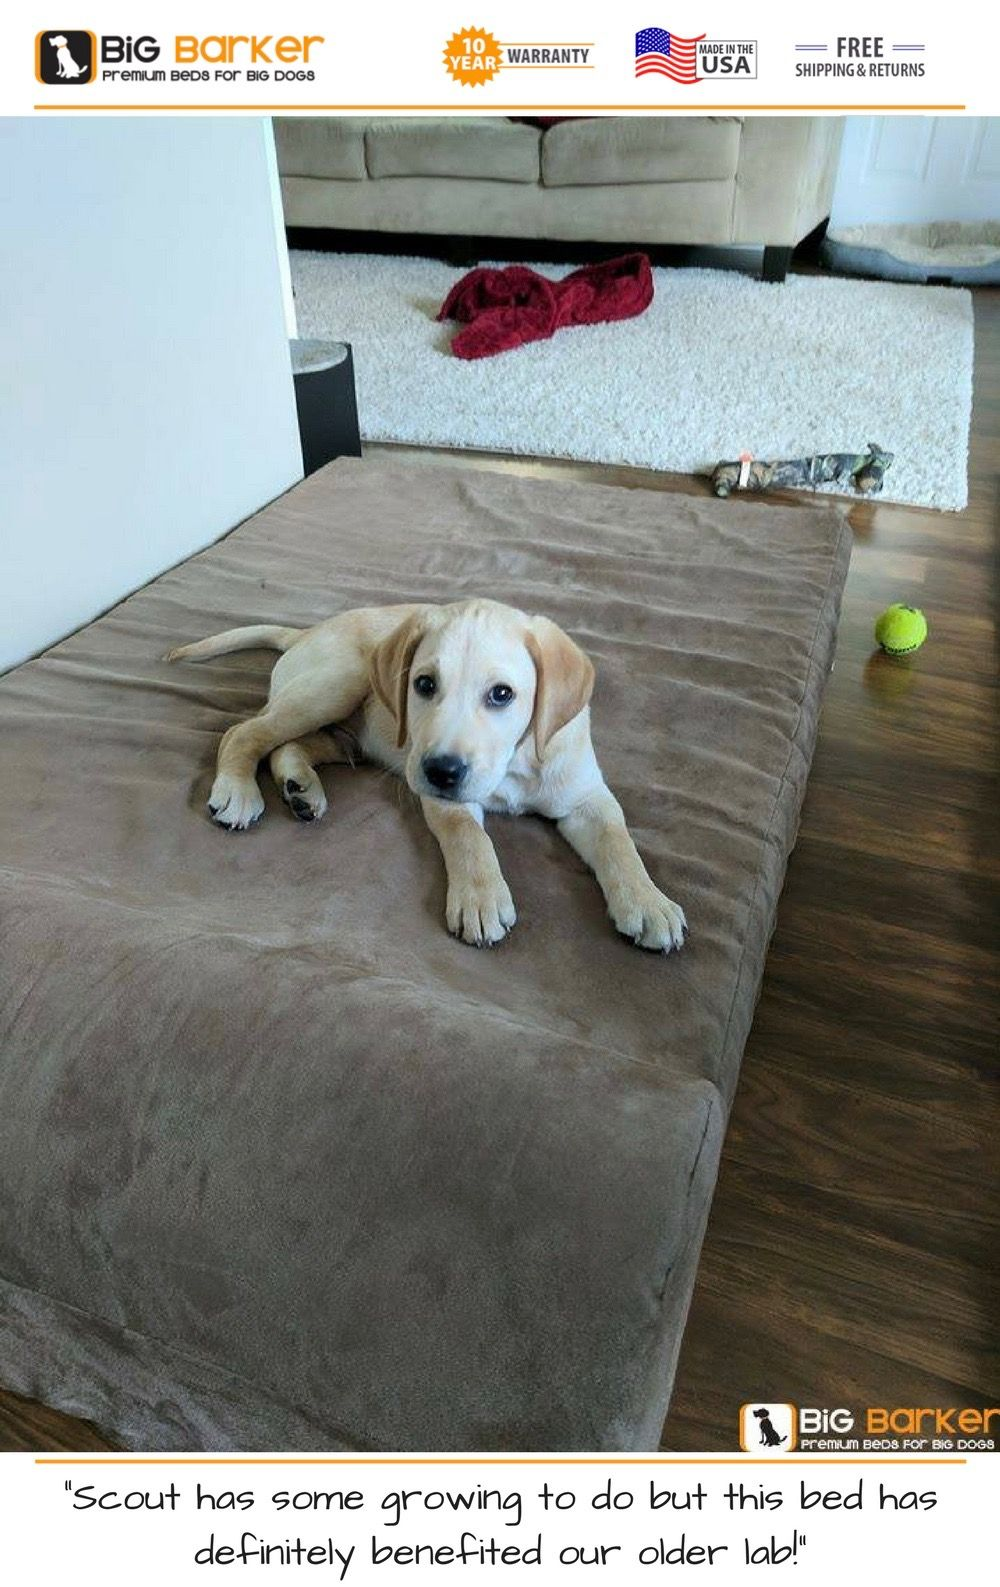 Orthopedic Dog Beds for Large & Extra Large Dogs Big